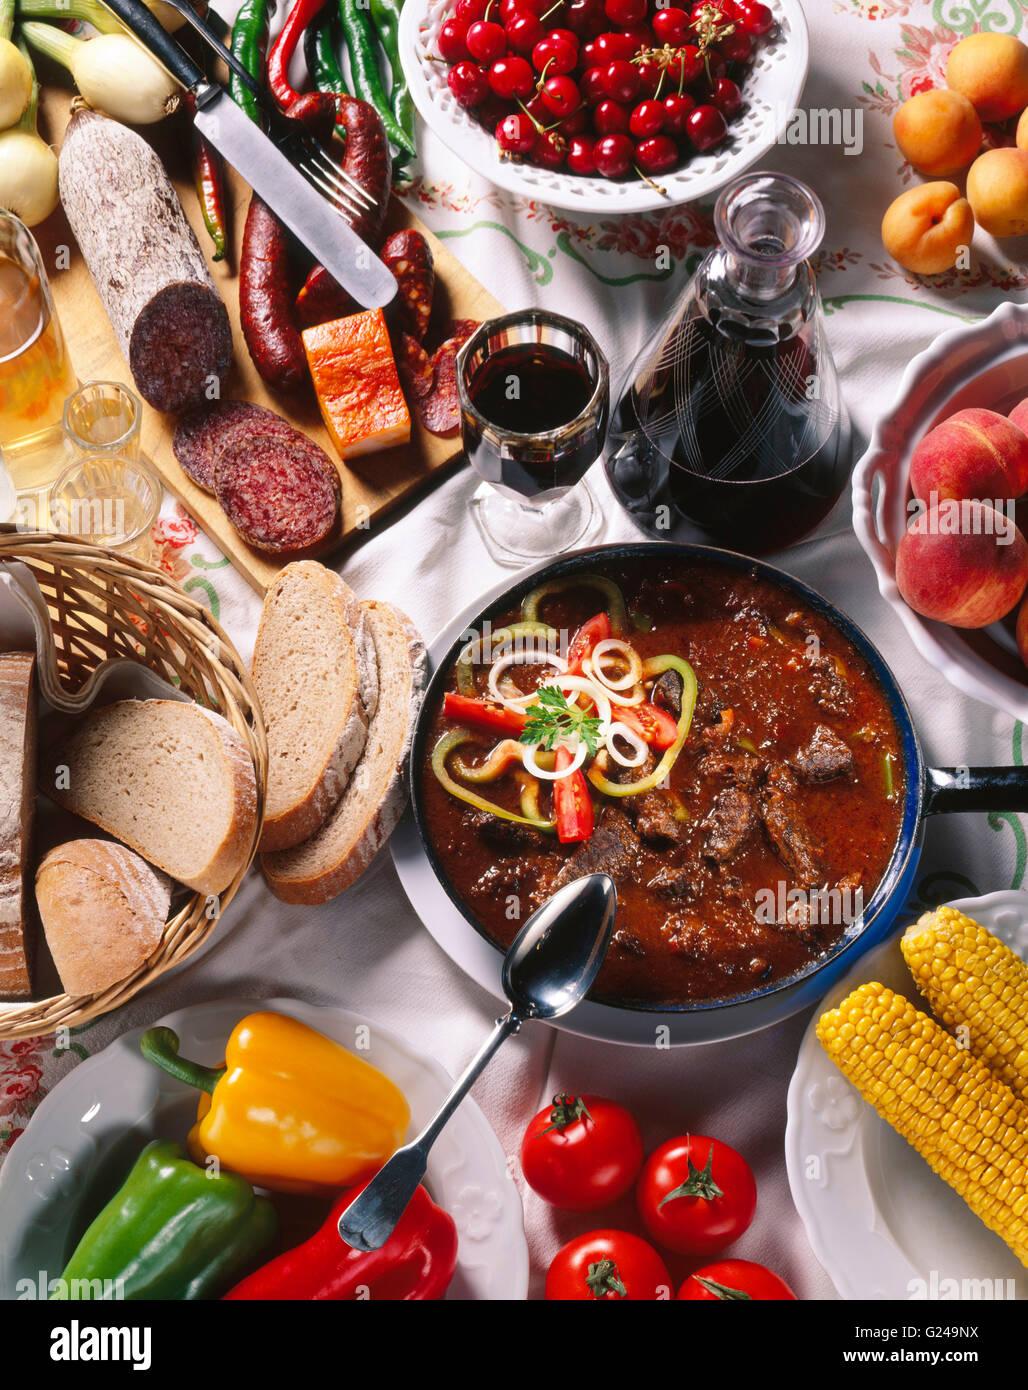 Hungarian national cuisine, salami, sausages, paprika, goulash, red wine - Stock Image